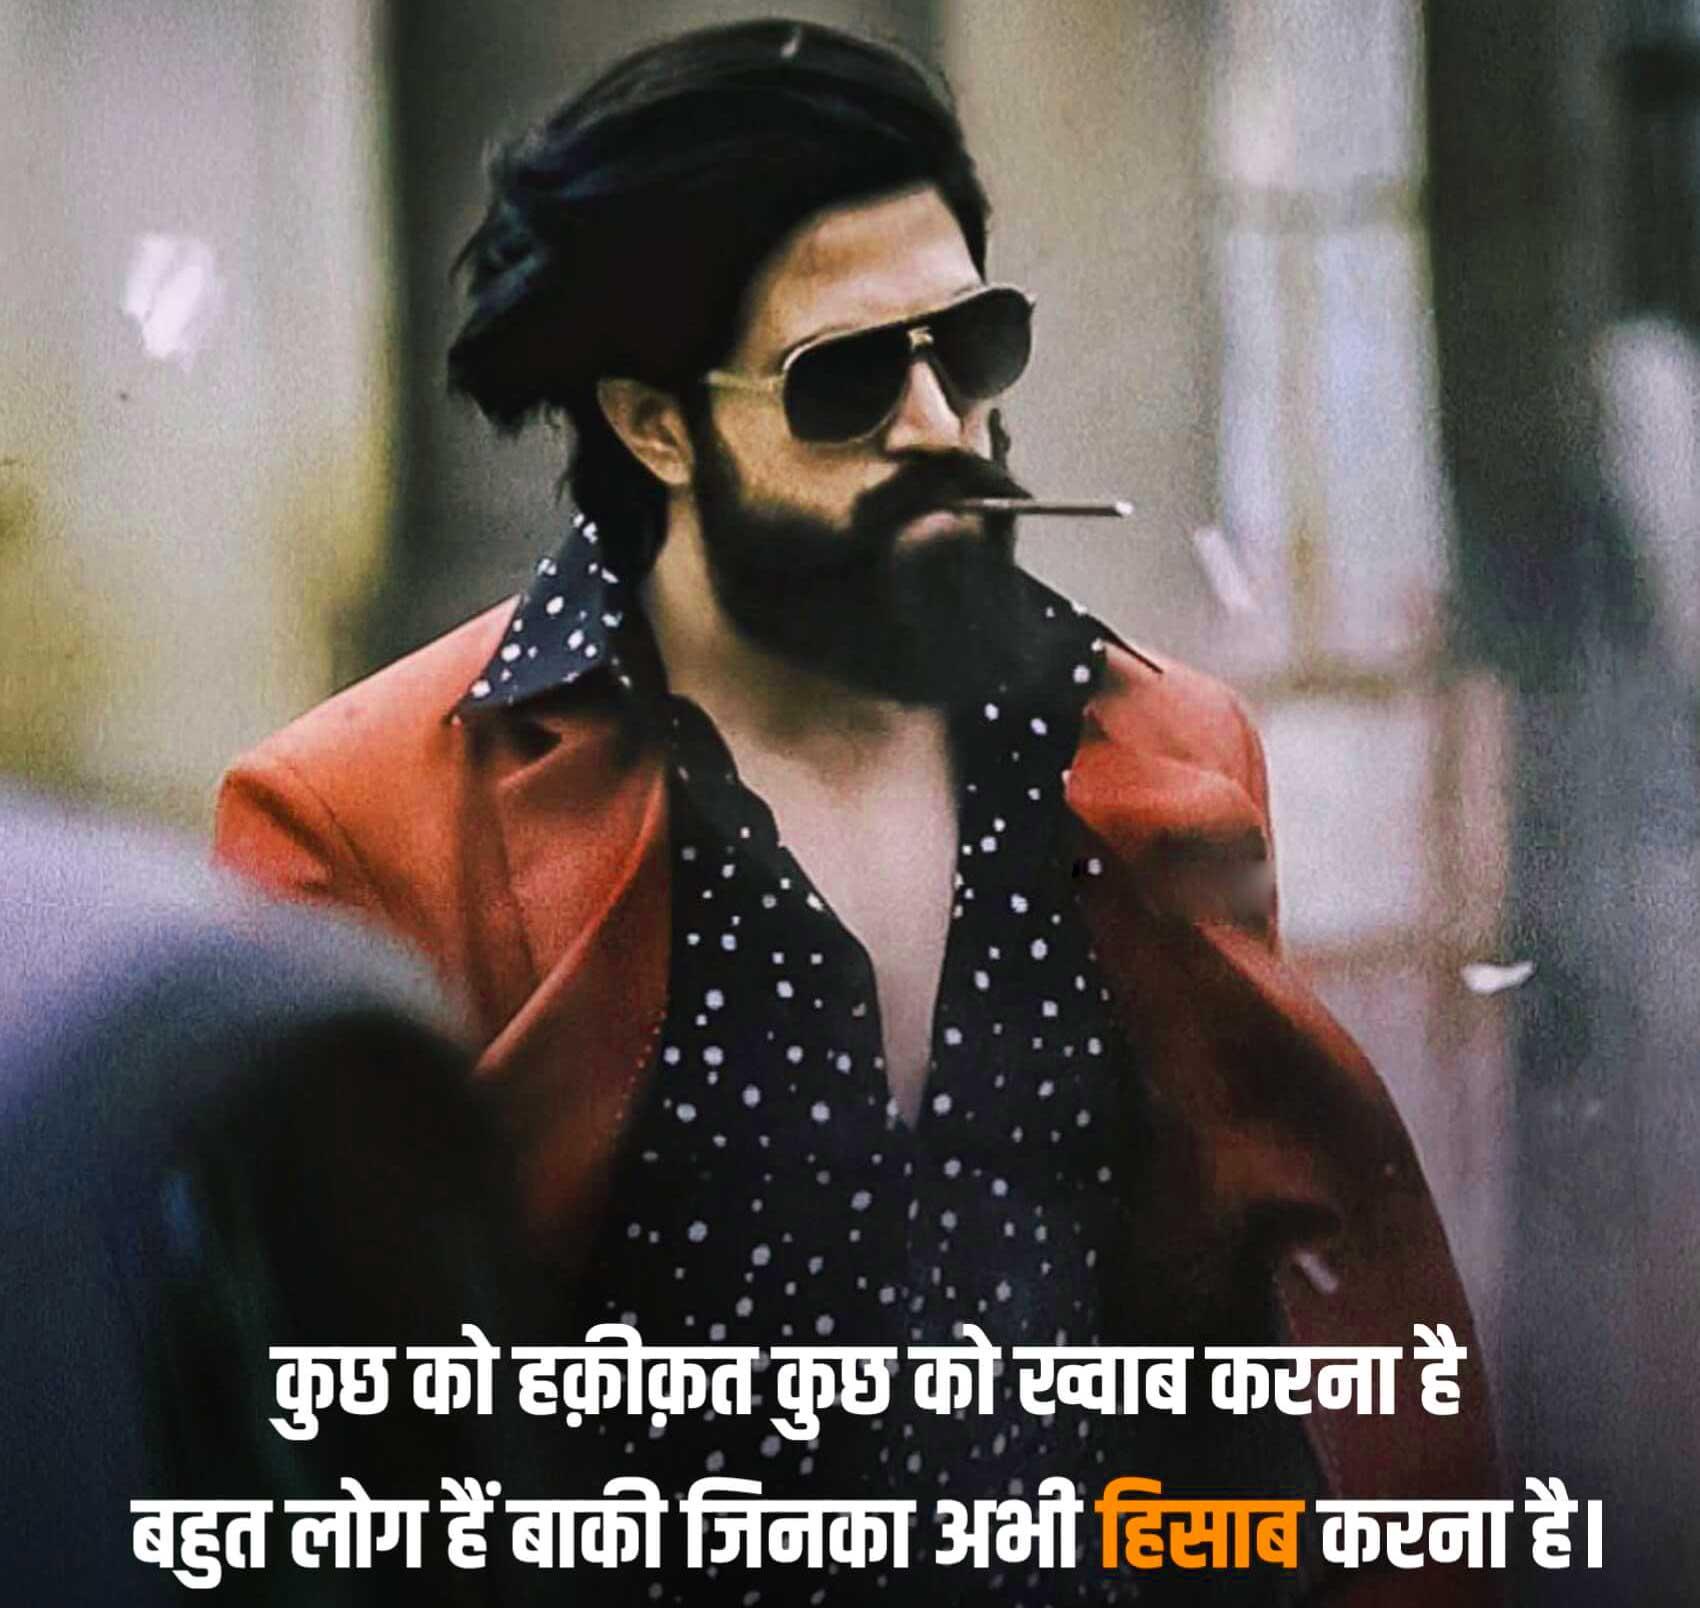 Killer Attitude Whatsapp Dp Pics Hd